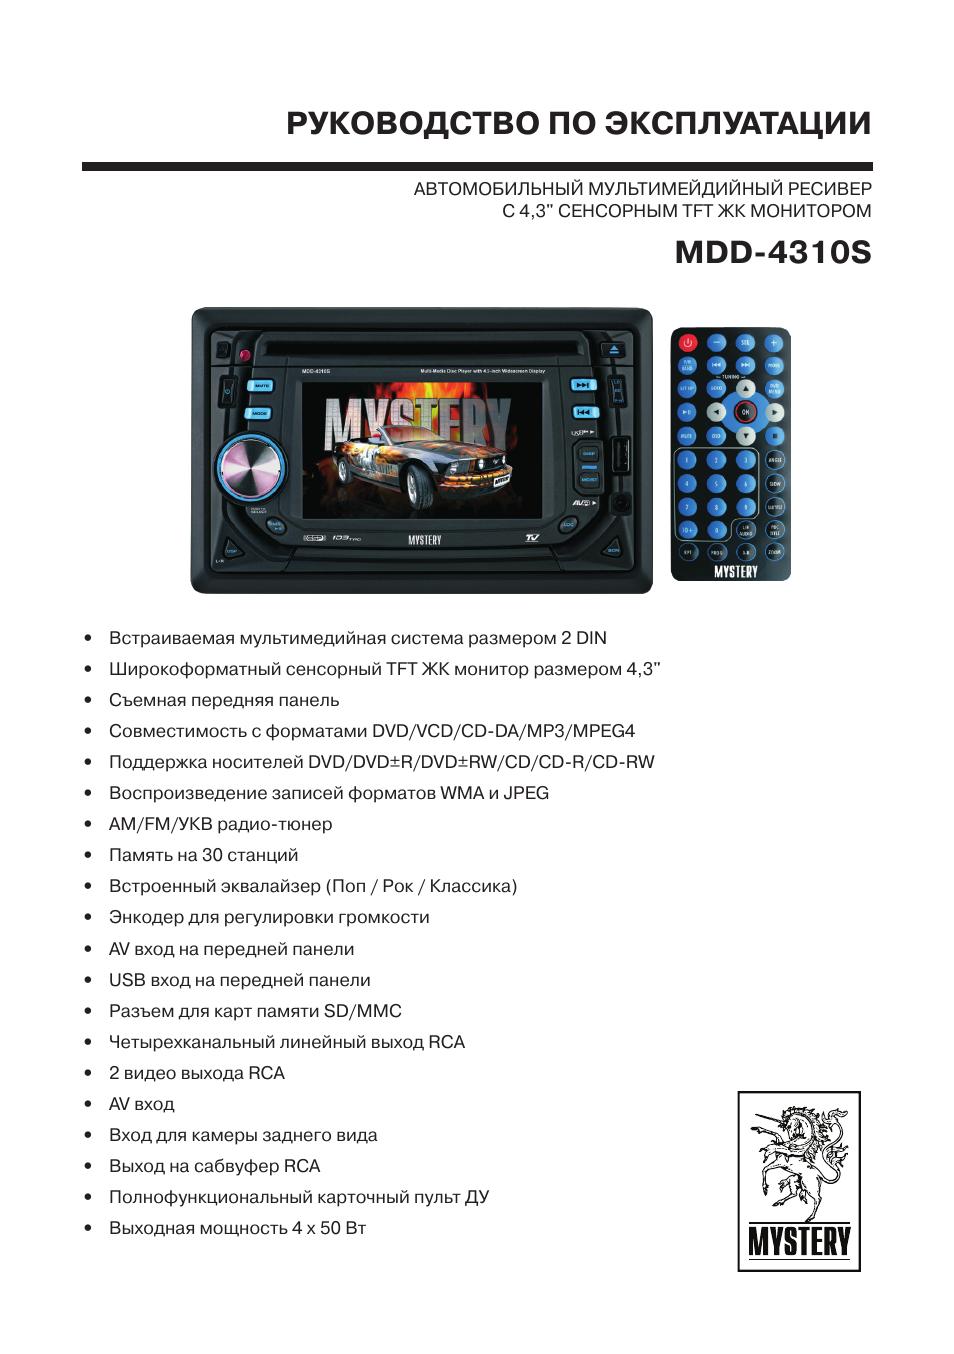 Mystery mdd 4310s схема